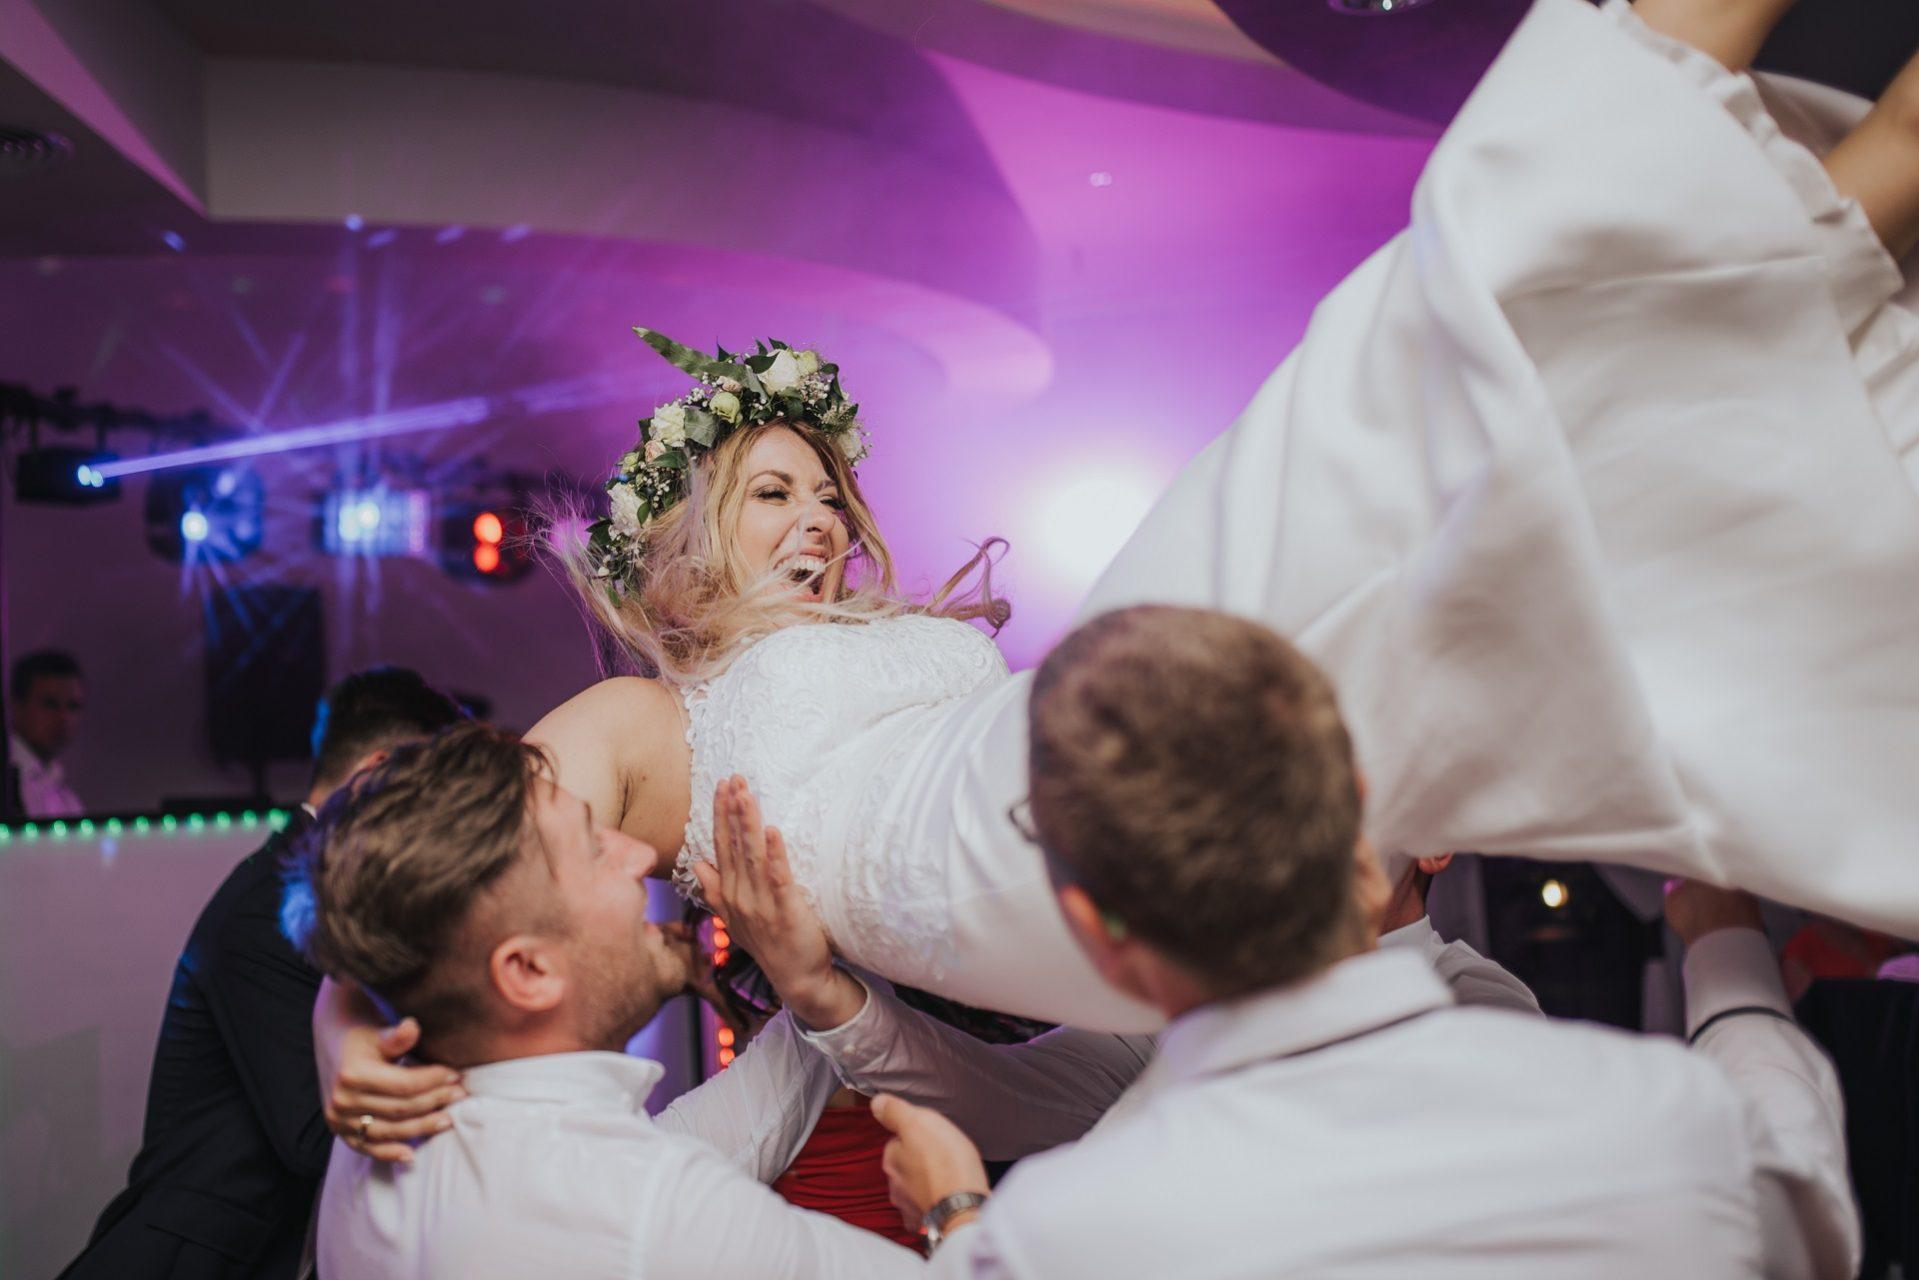 Panna Młoda na weselu, podrzucana na weselu Panna Młoda